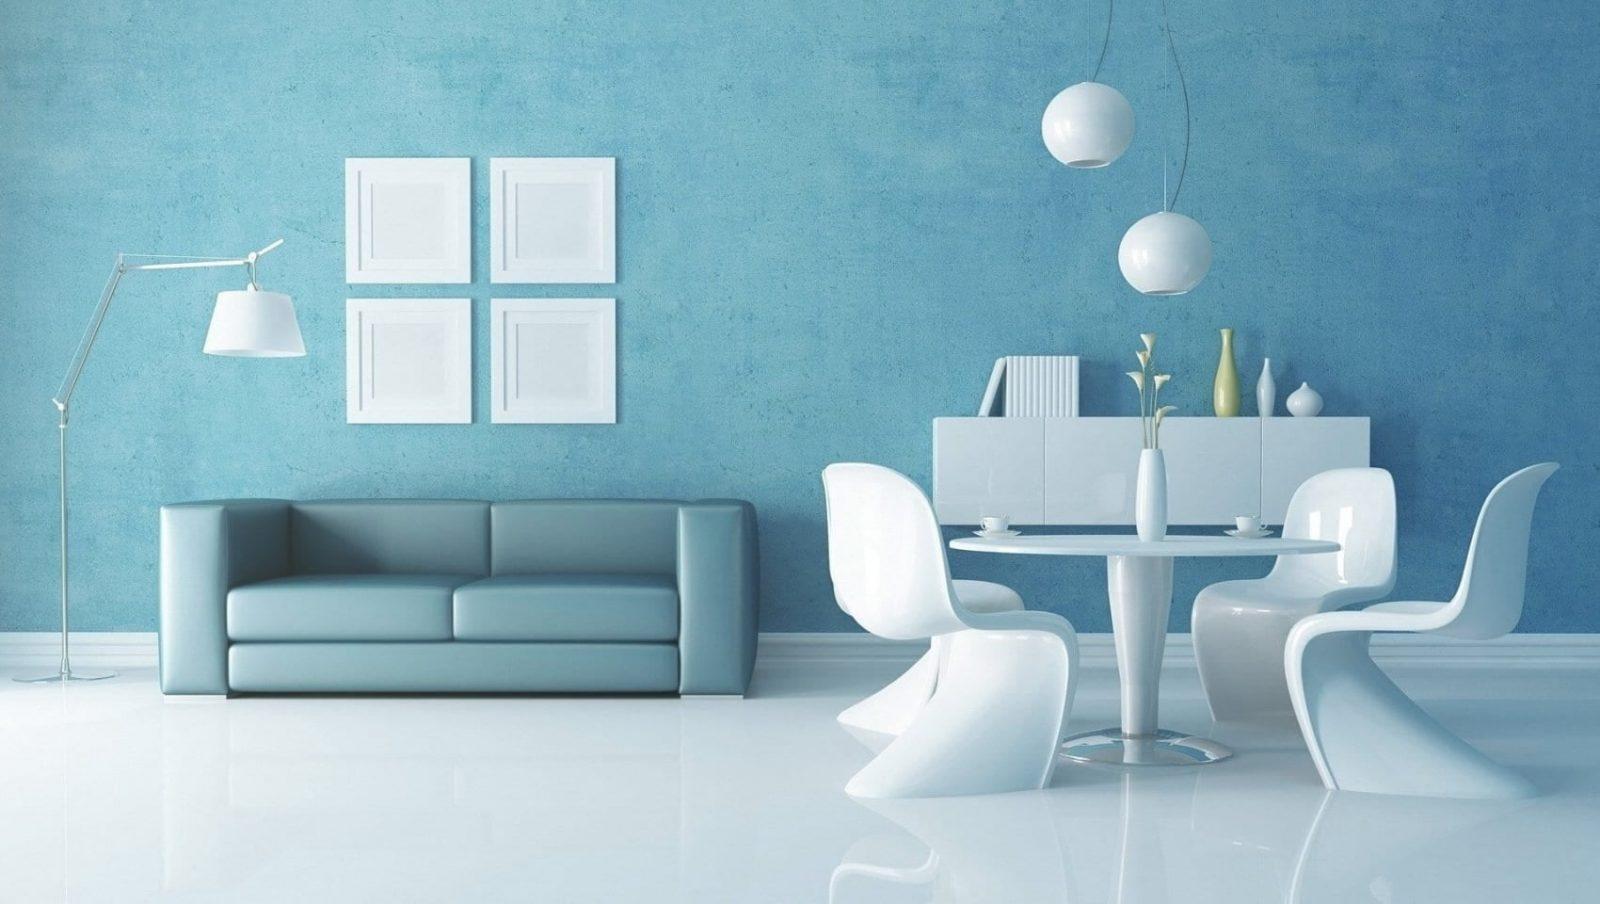 tendências de decoração 2020 monocromia joinville